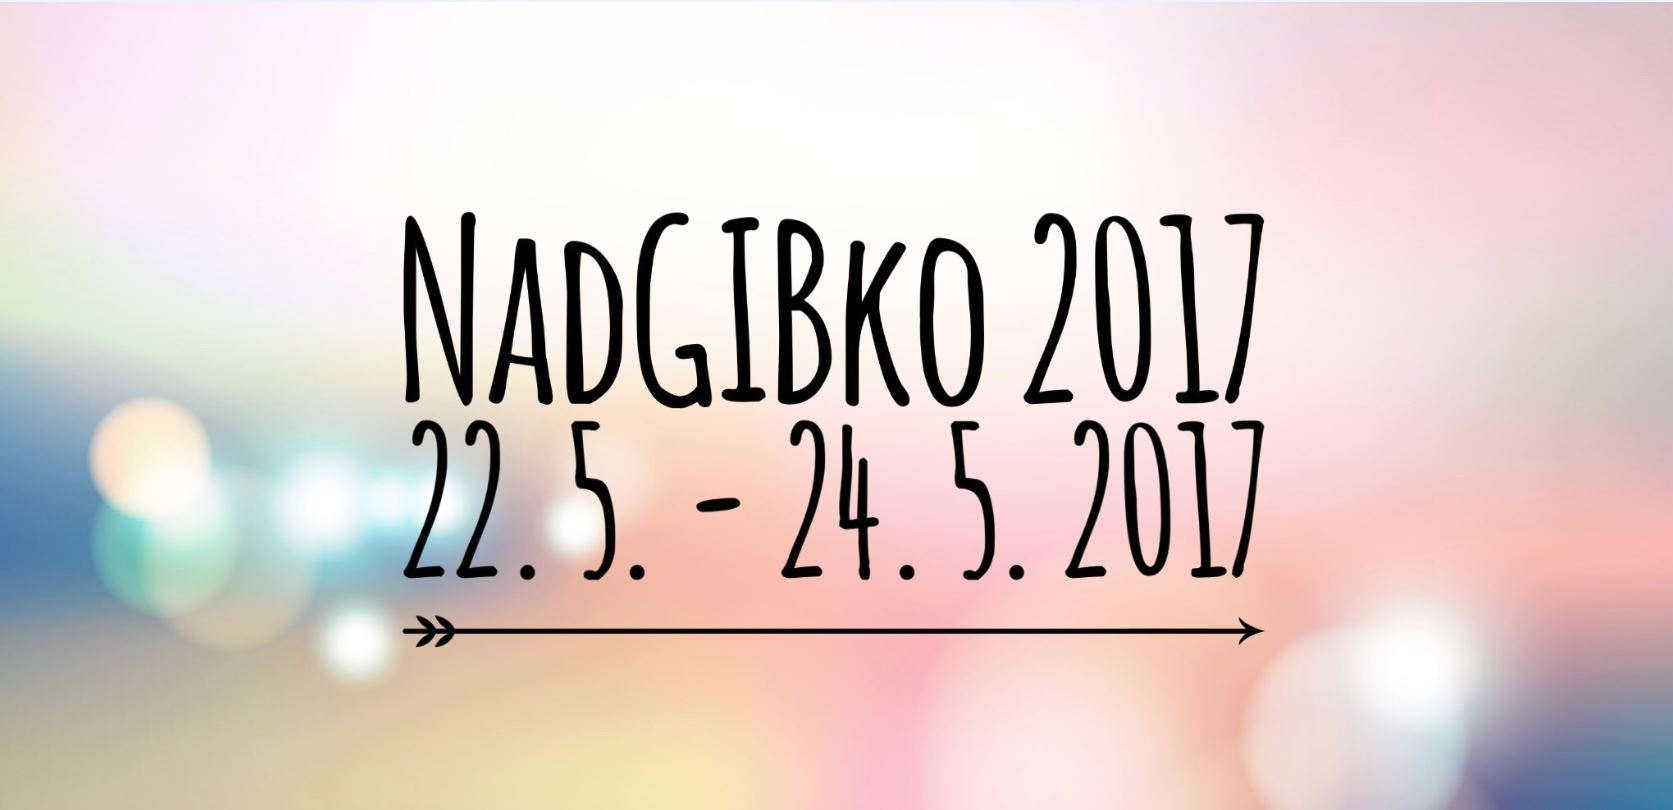 Tabor NadGIBko 2017